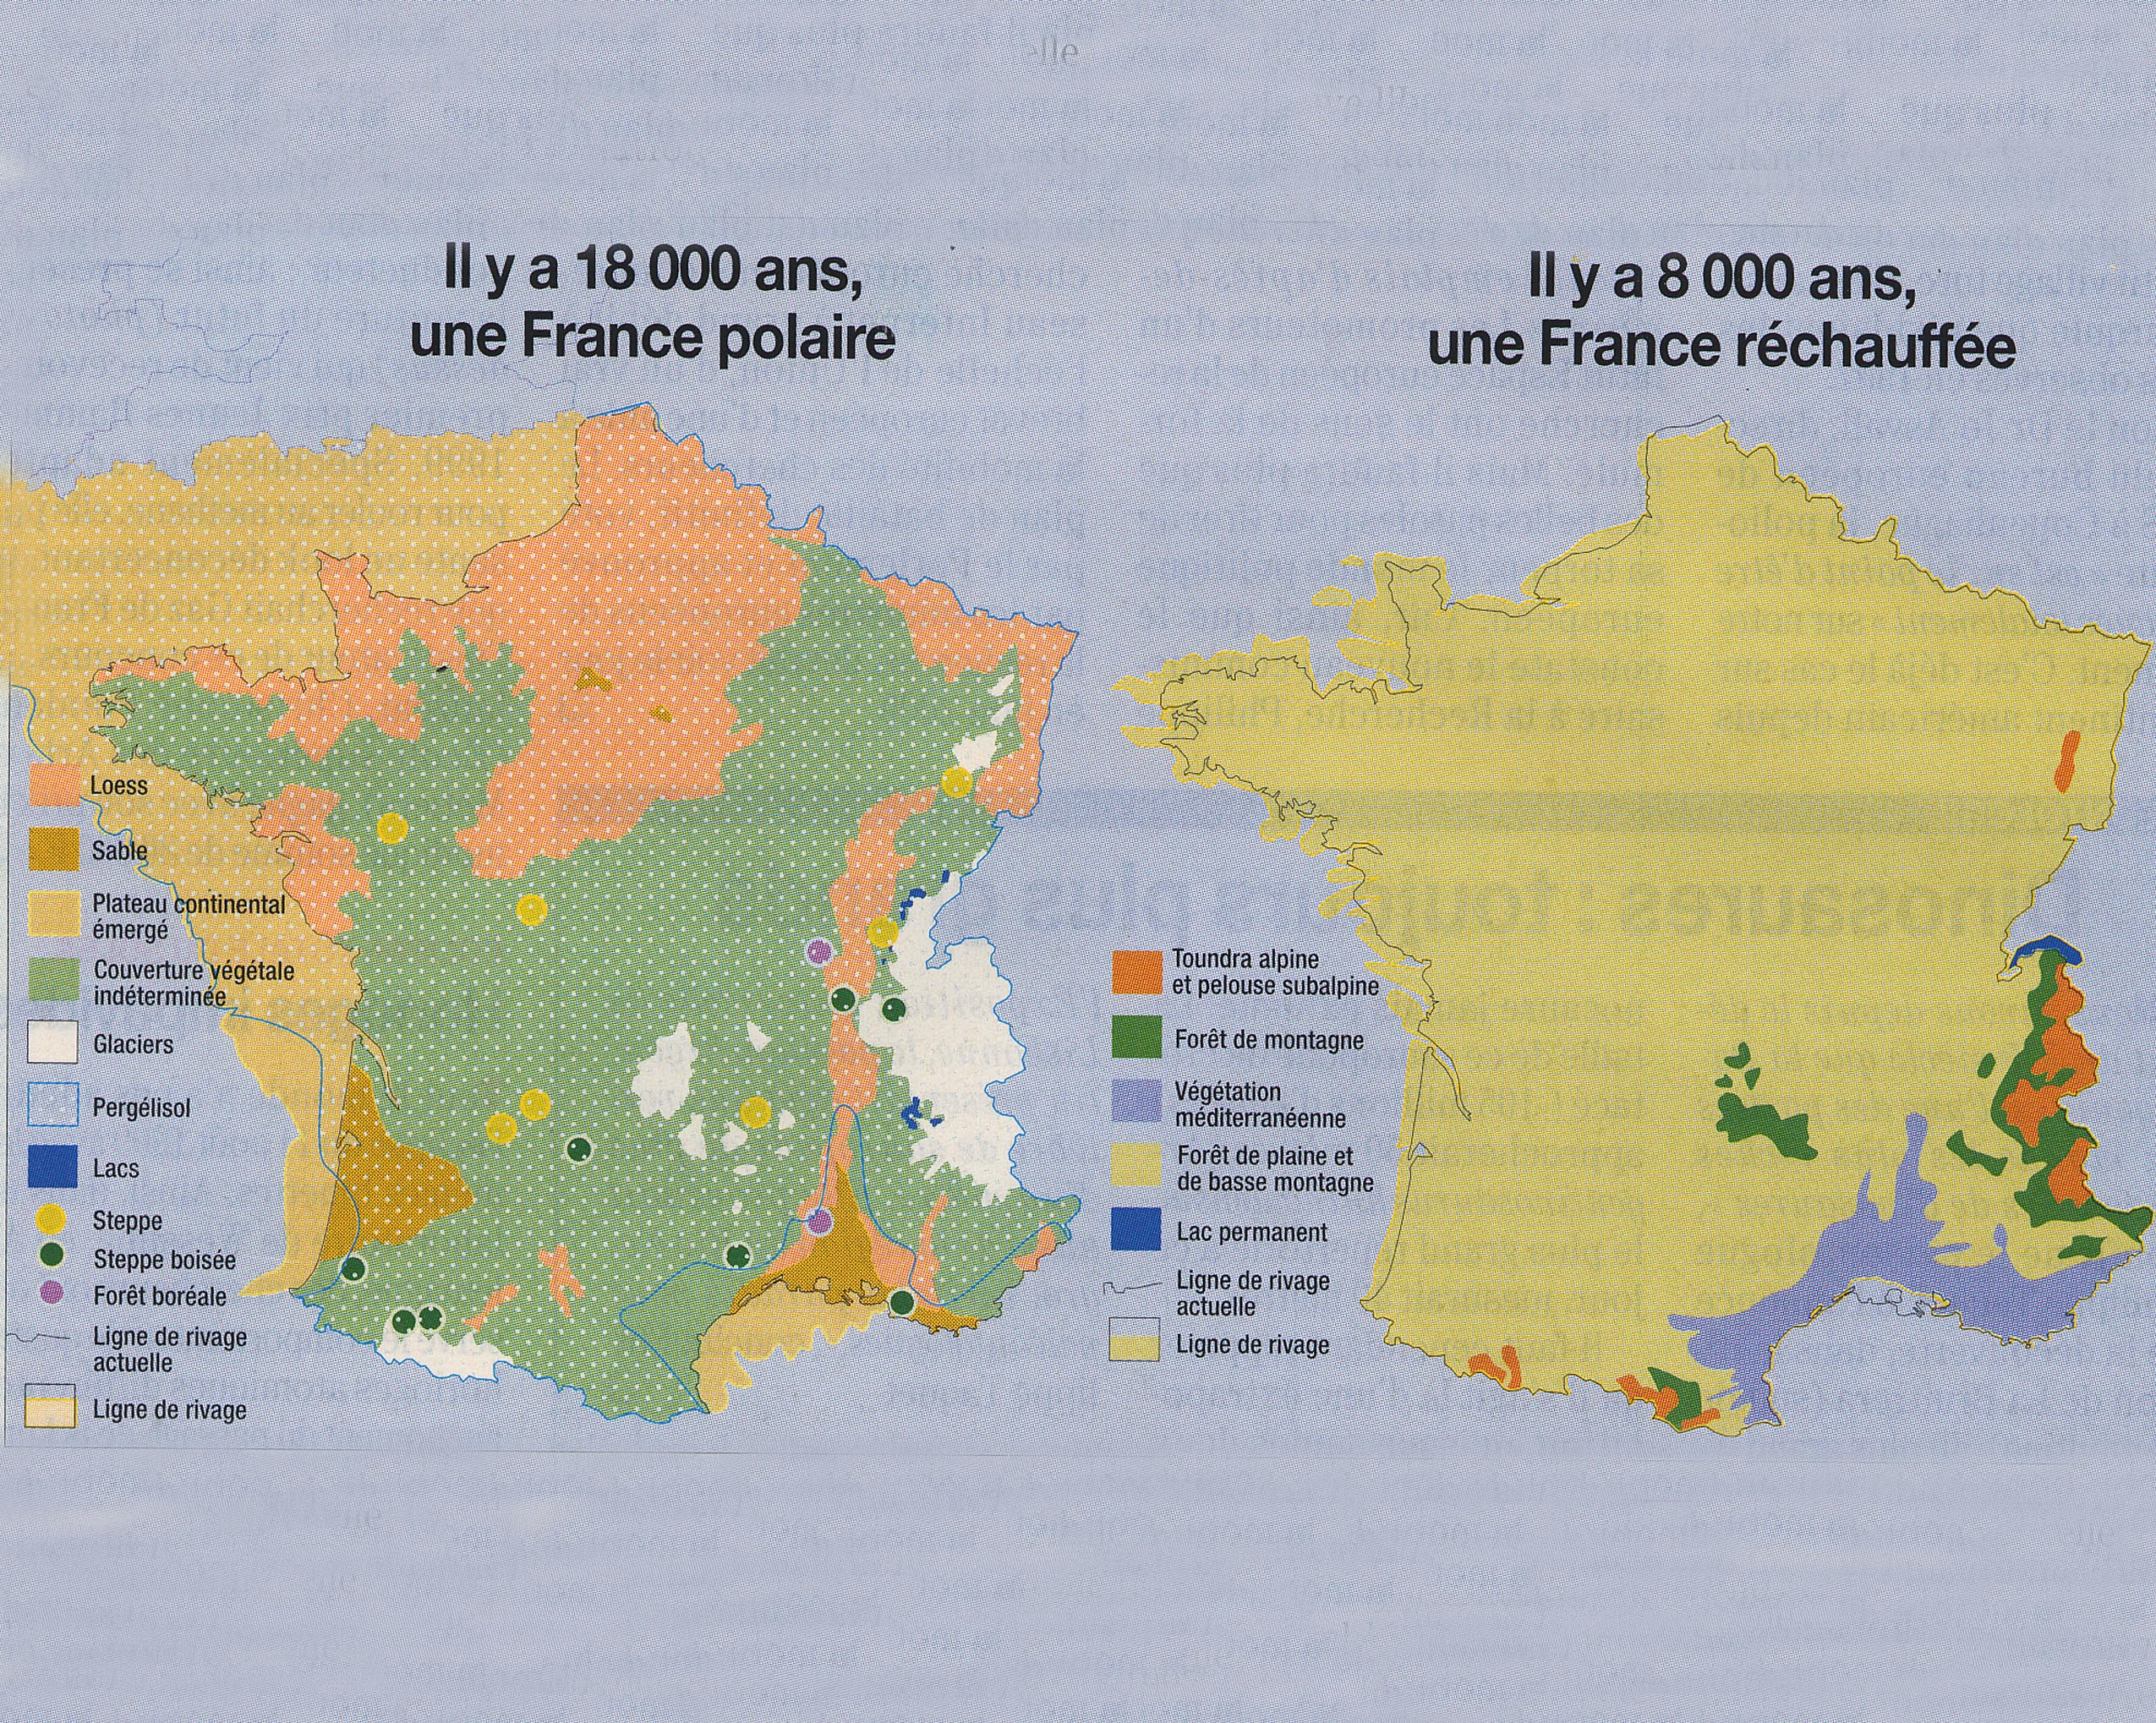 France polaire